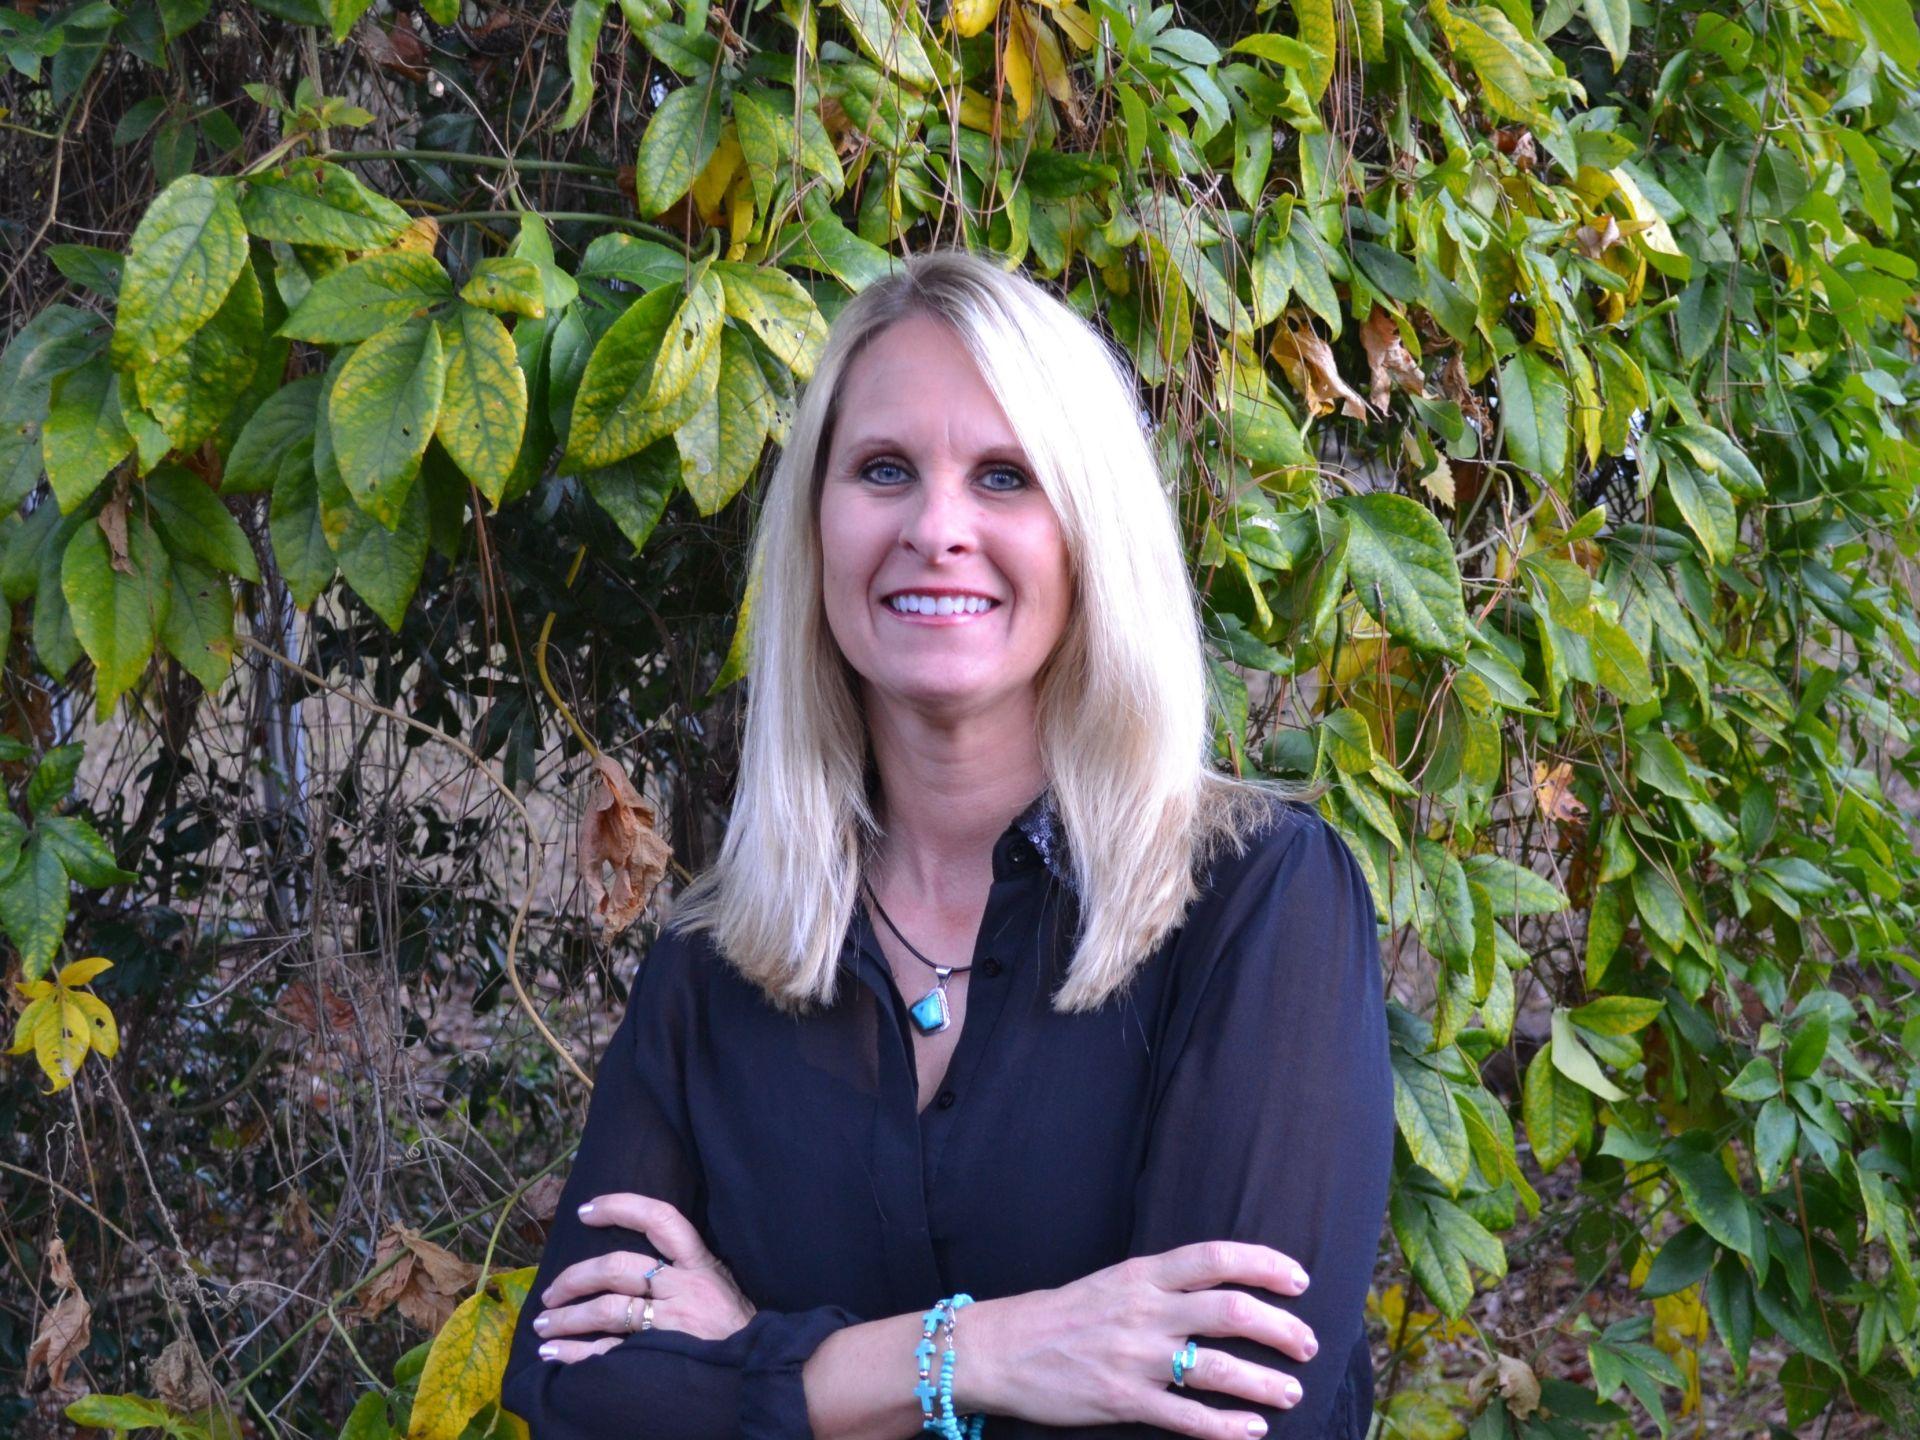 Julie Shetler Earns NAR's Military Relocation Professional Certification